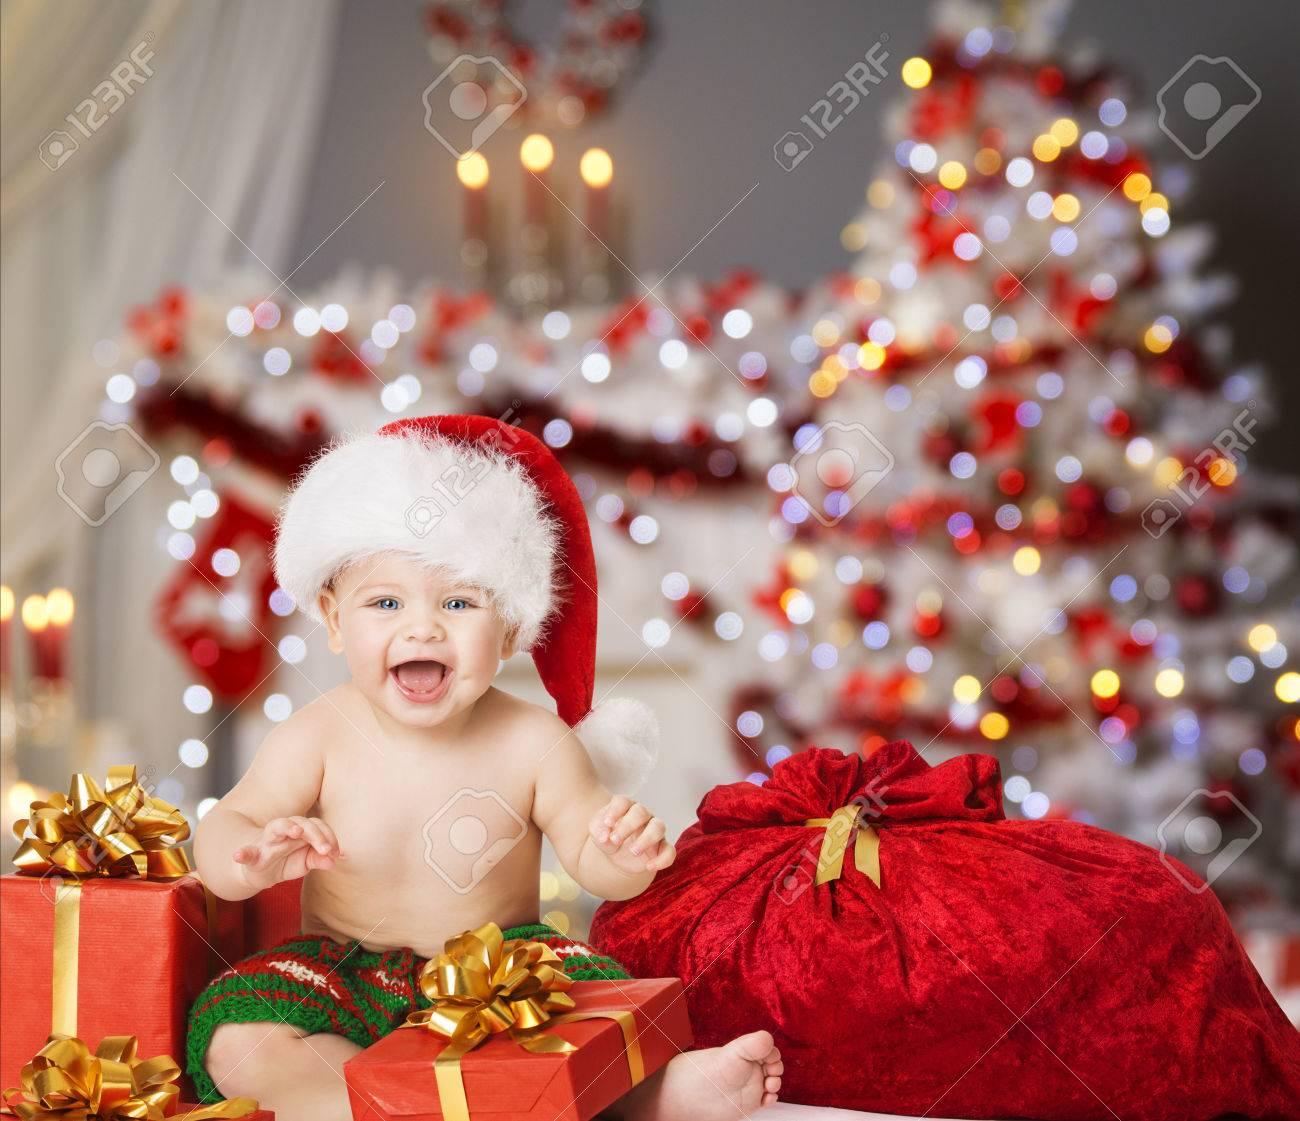 Christmas Baby in Santa Hat, Kid Boy with Xmas Present Gift Box and Bag - 65114199